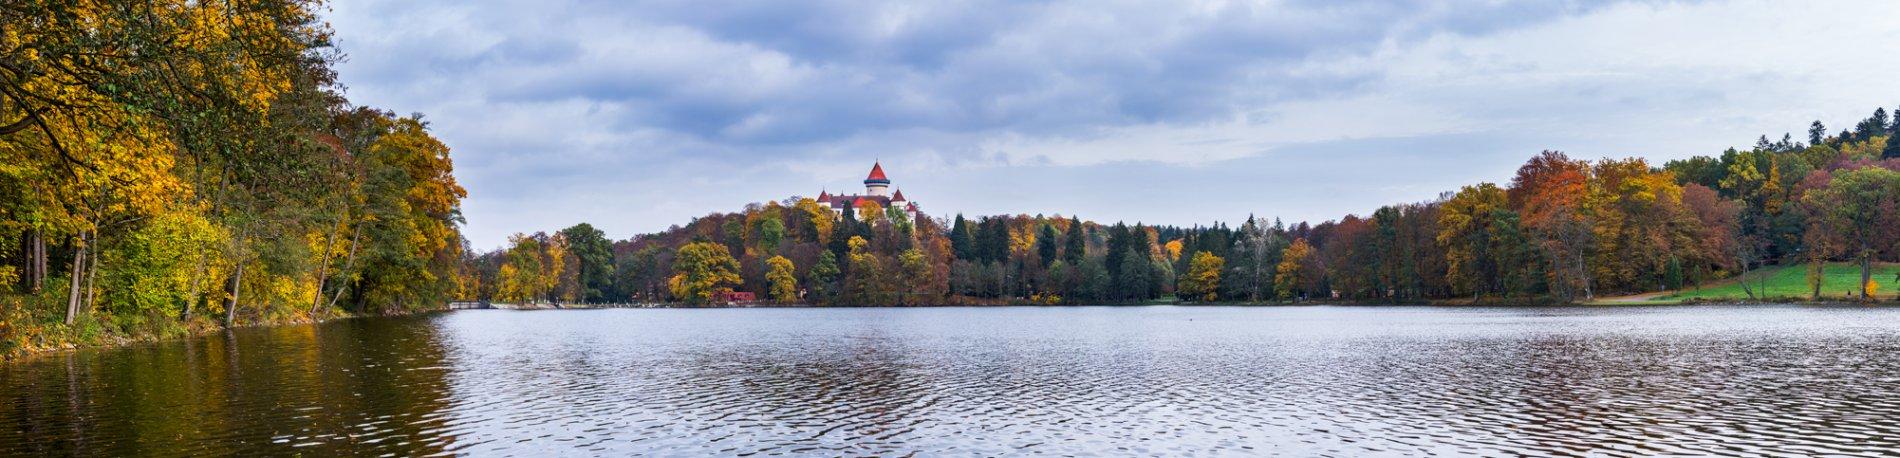 Konopiste Castle Tour – Prague to Konopiste